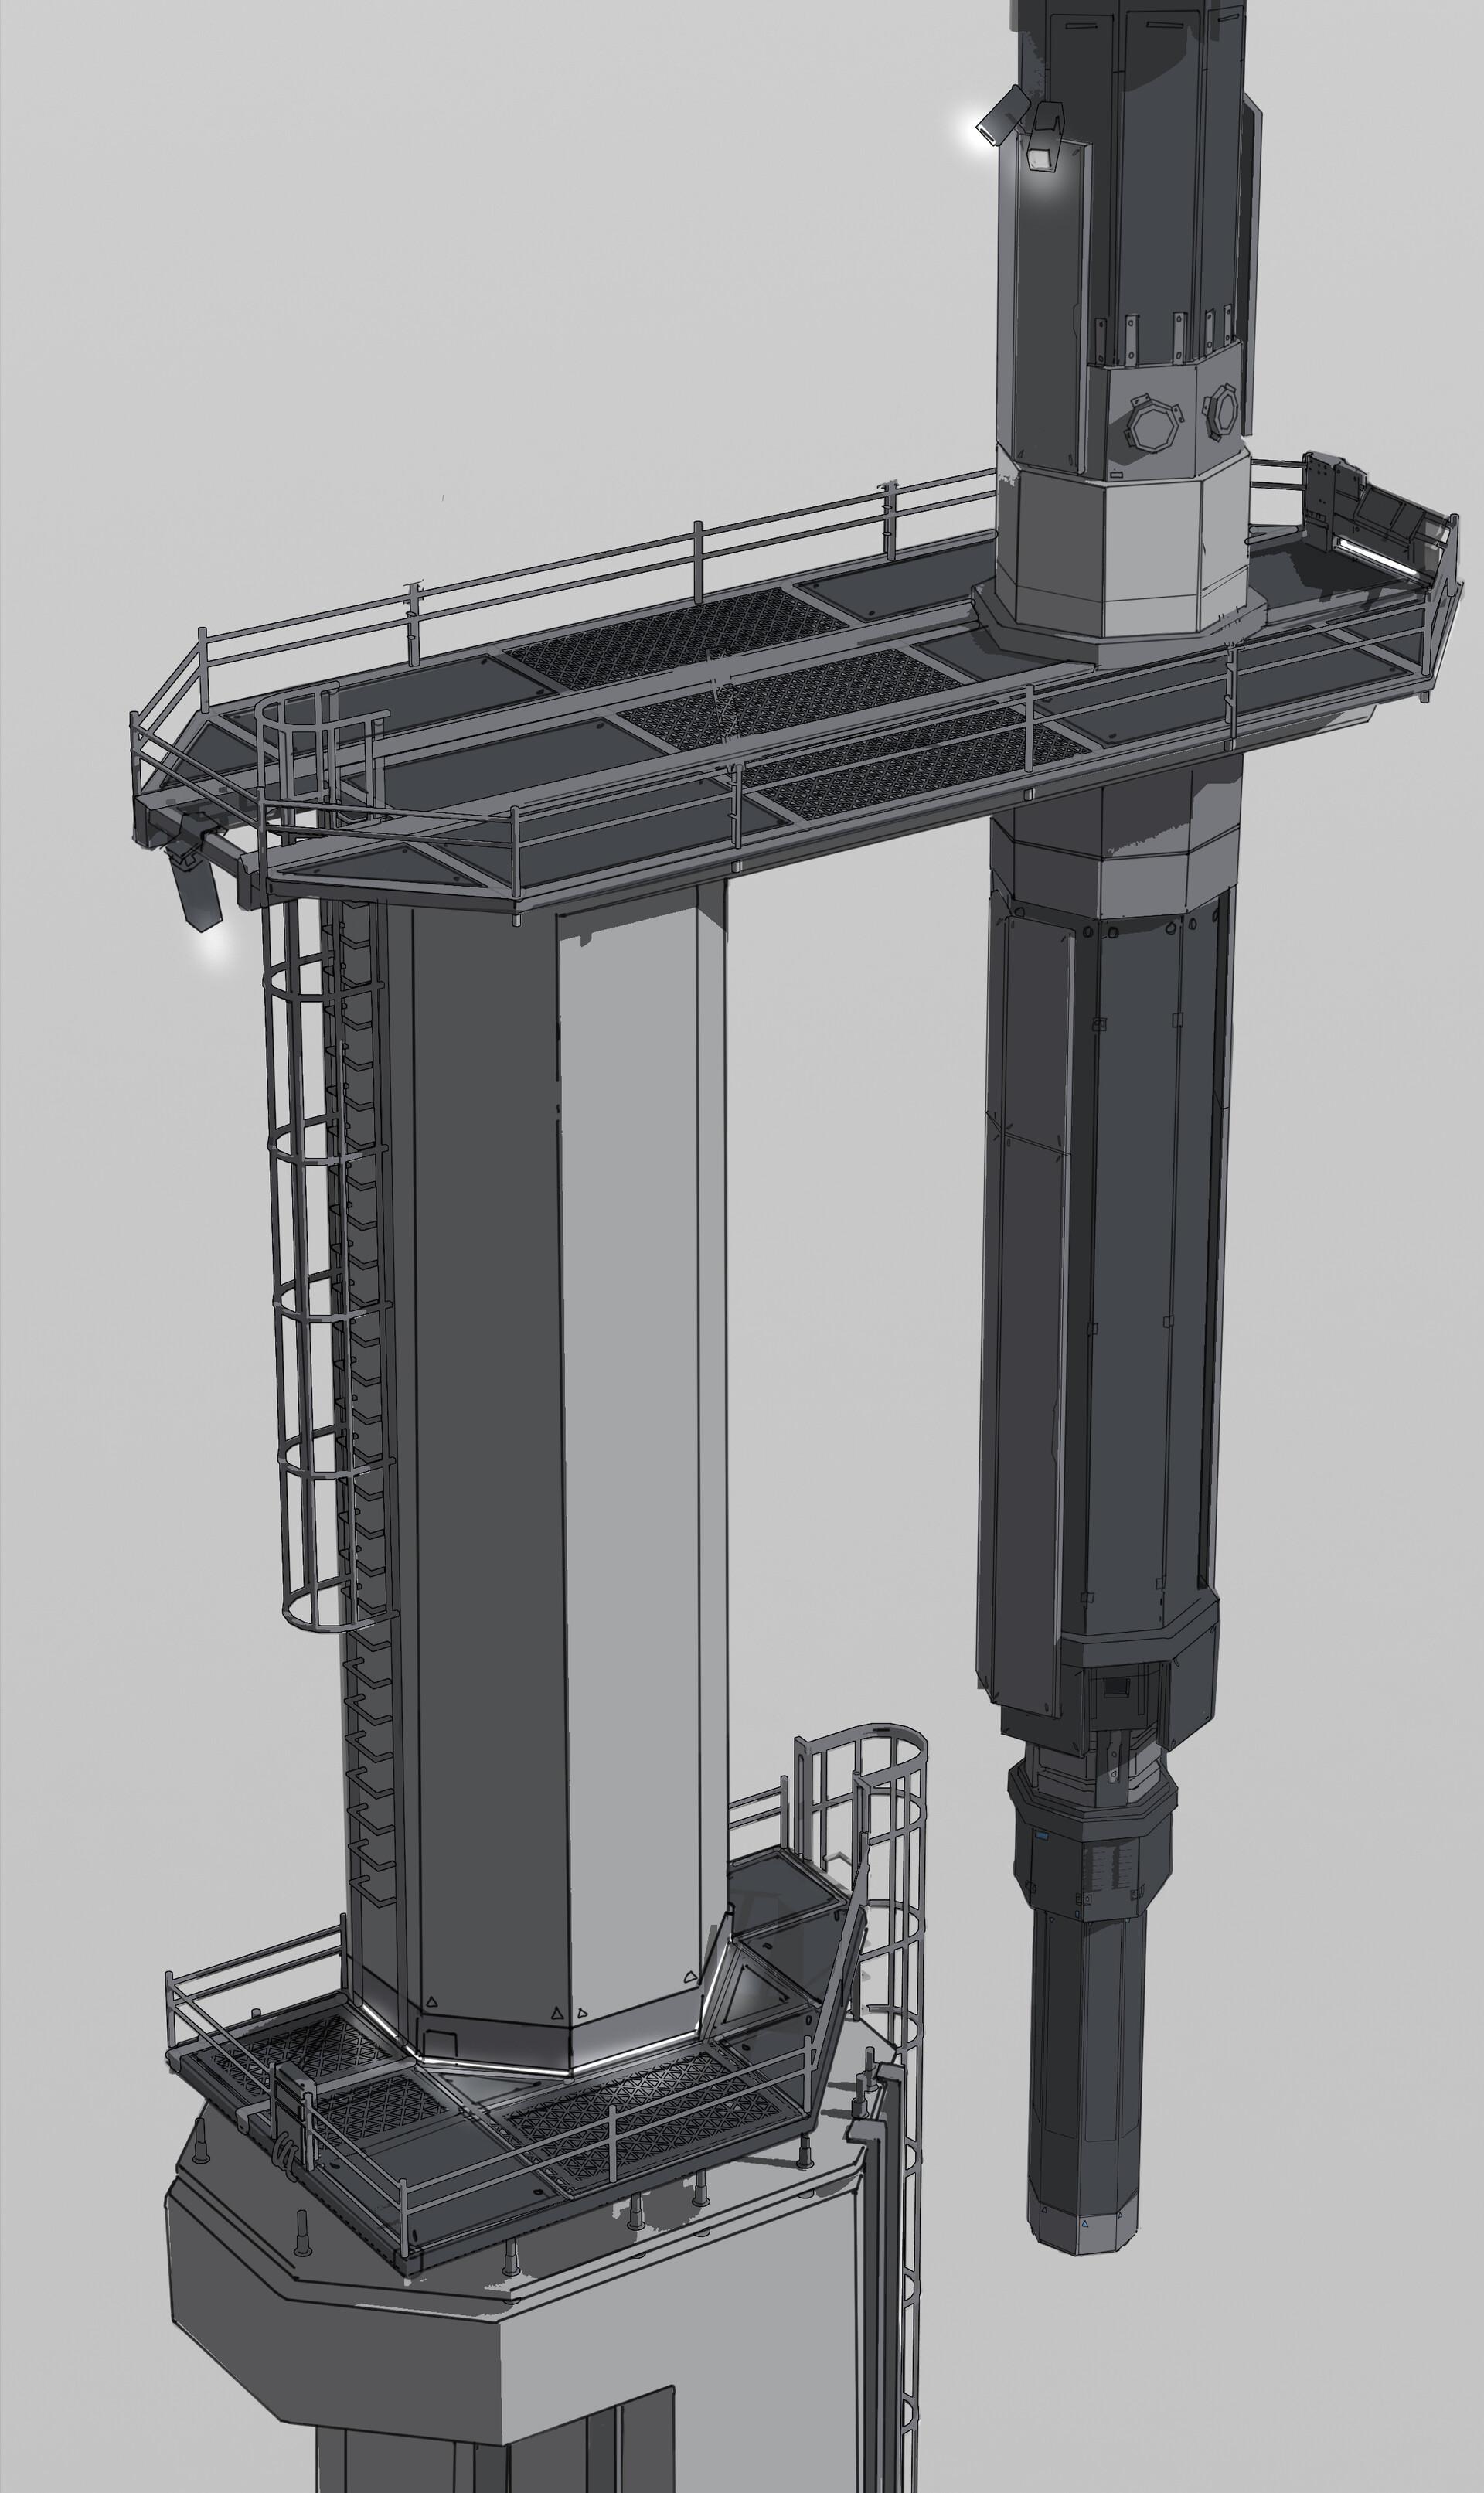 Connor sheehan mast development topview01